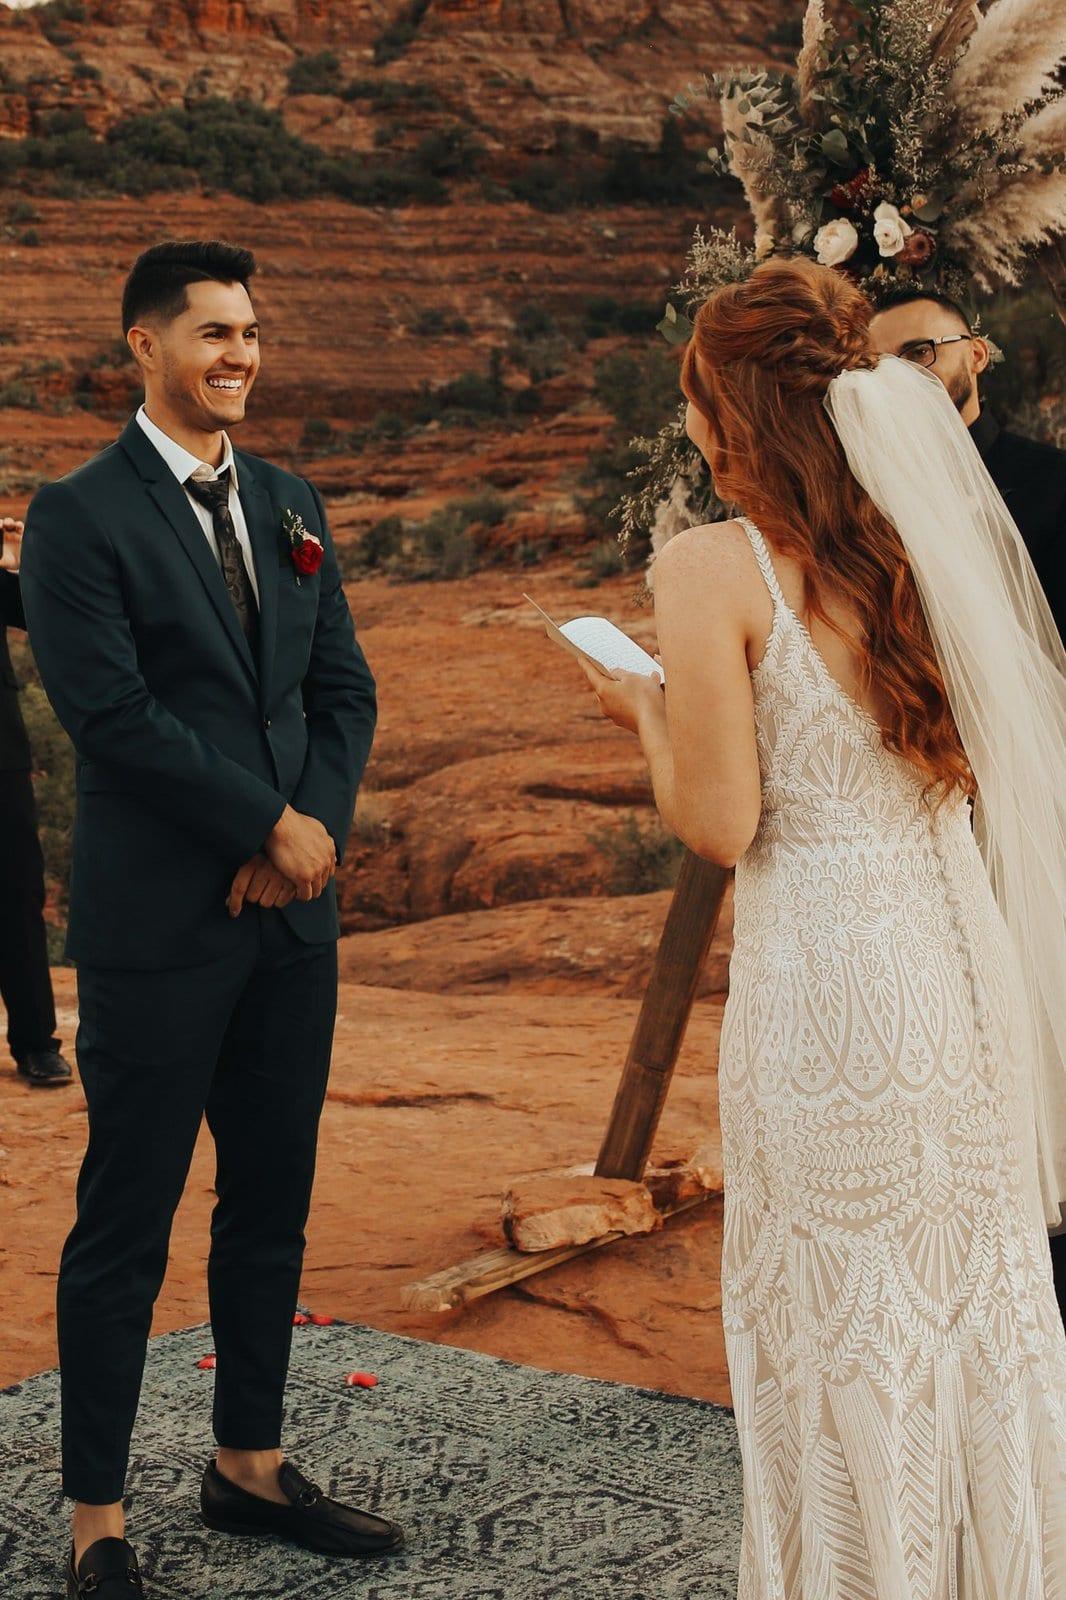 wedding vows at red rocks